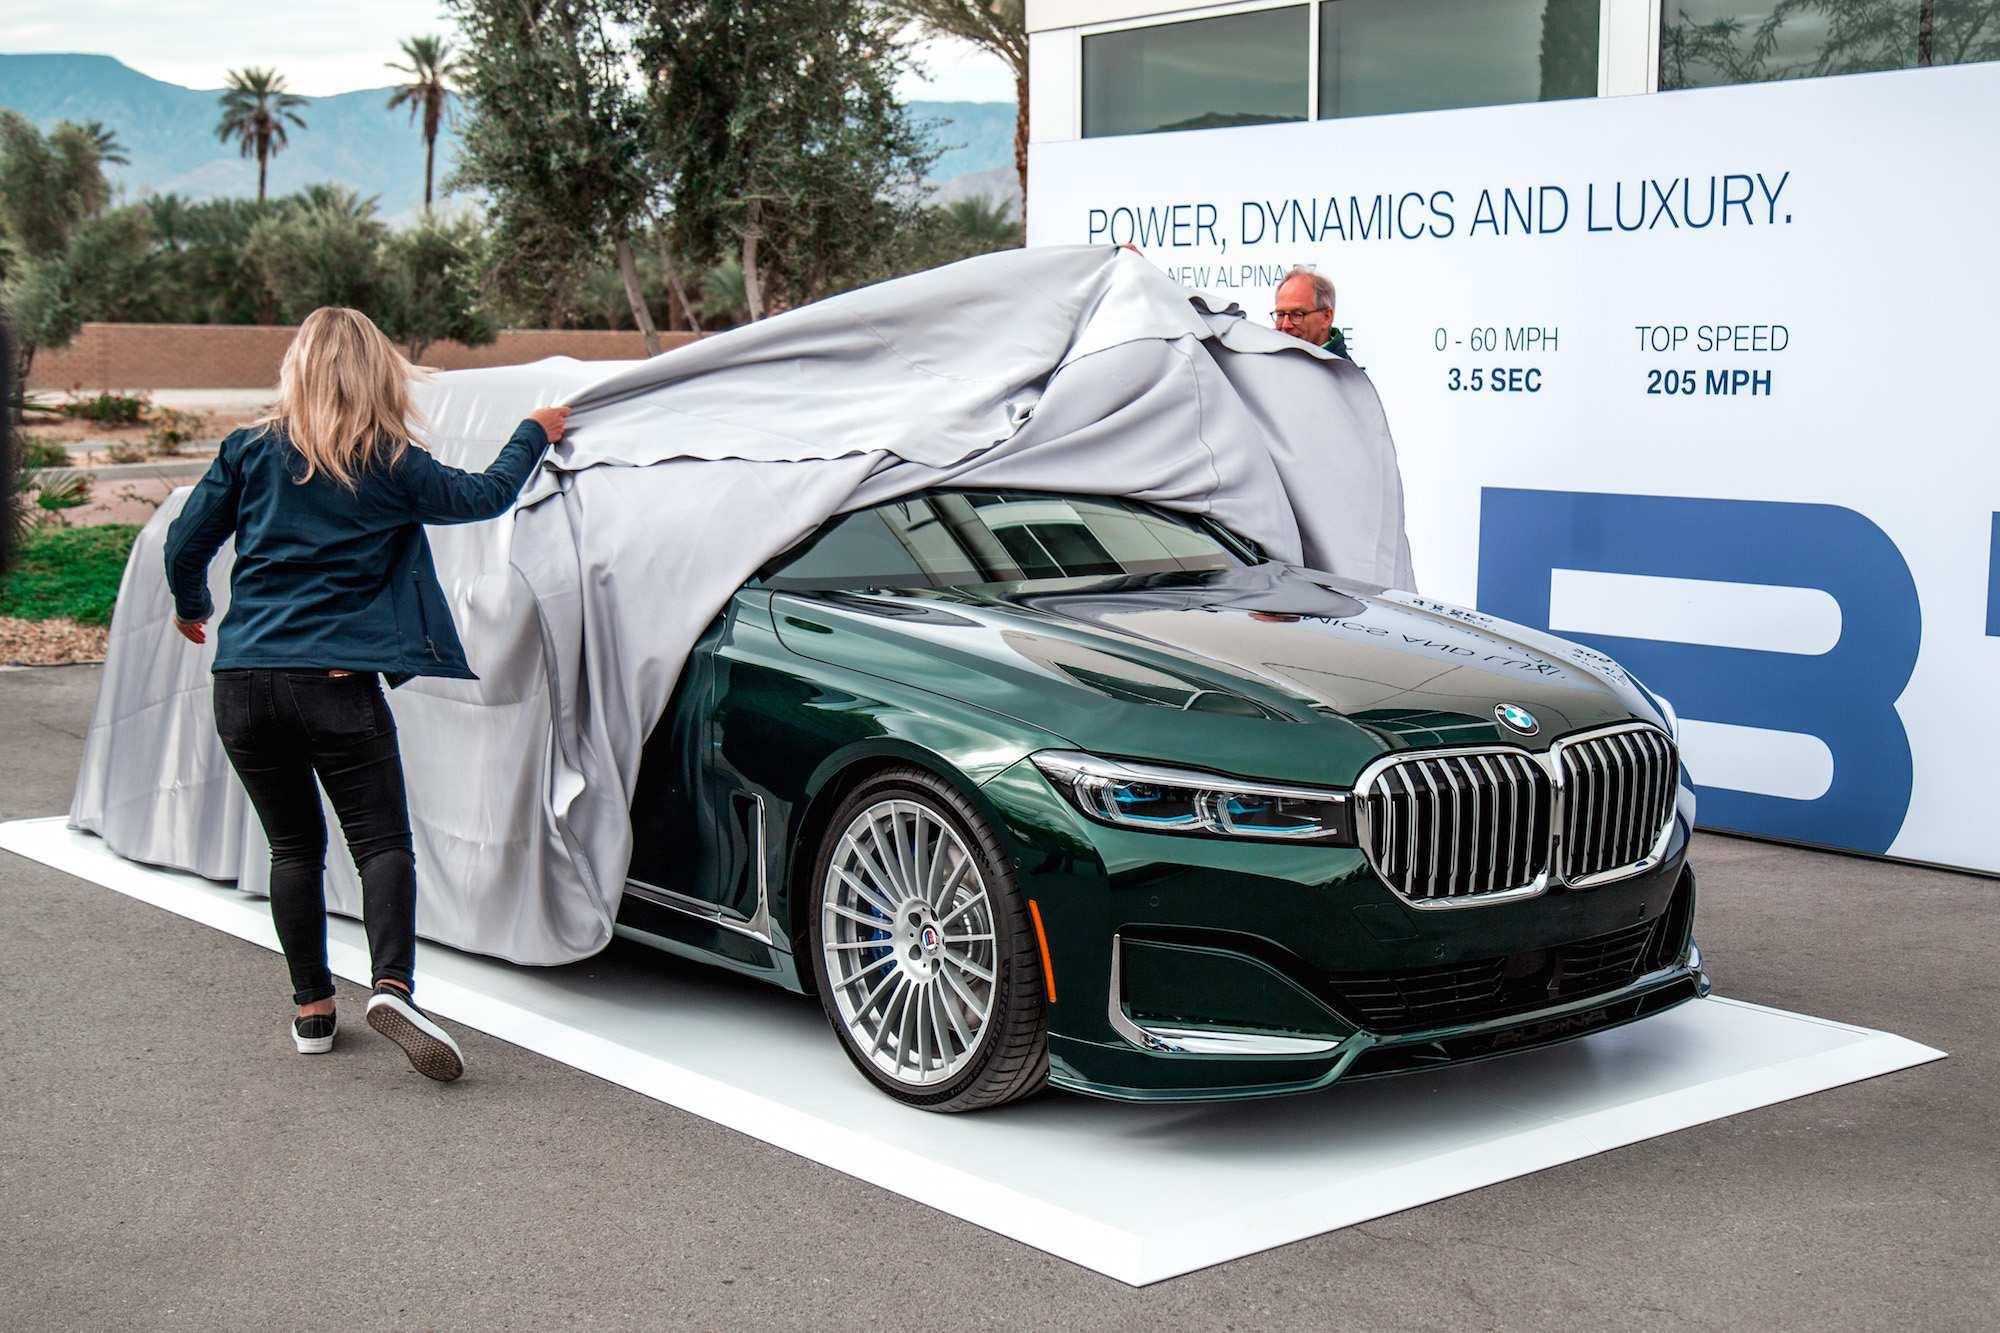 57 Best Review BMW B7 Alpina 2020 Price New Review with BMW B7 Alpina 2020 Price